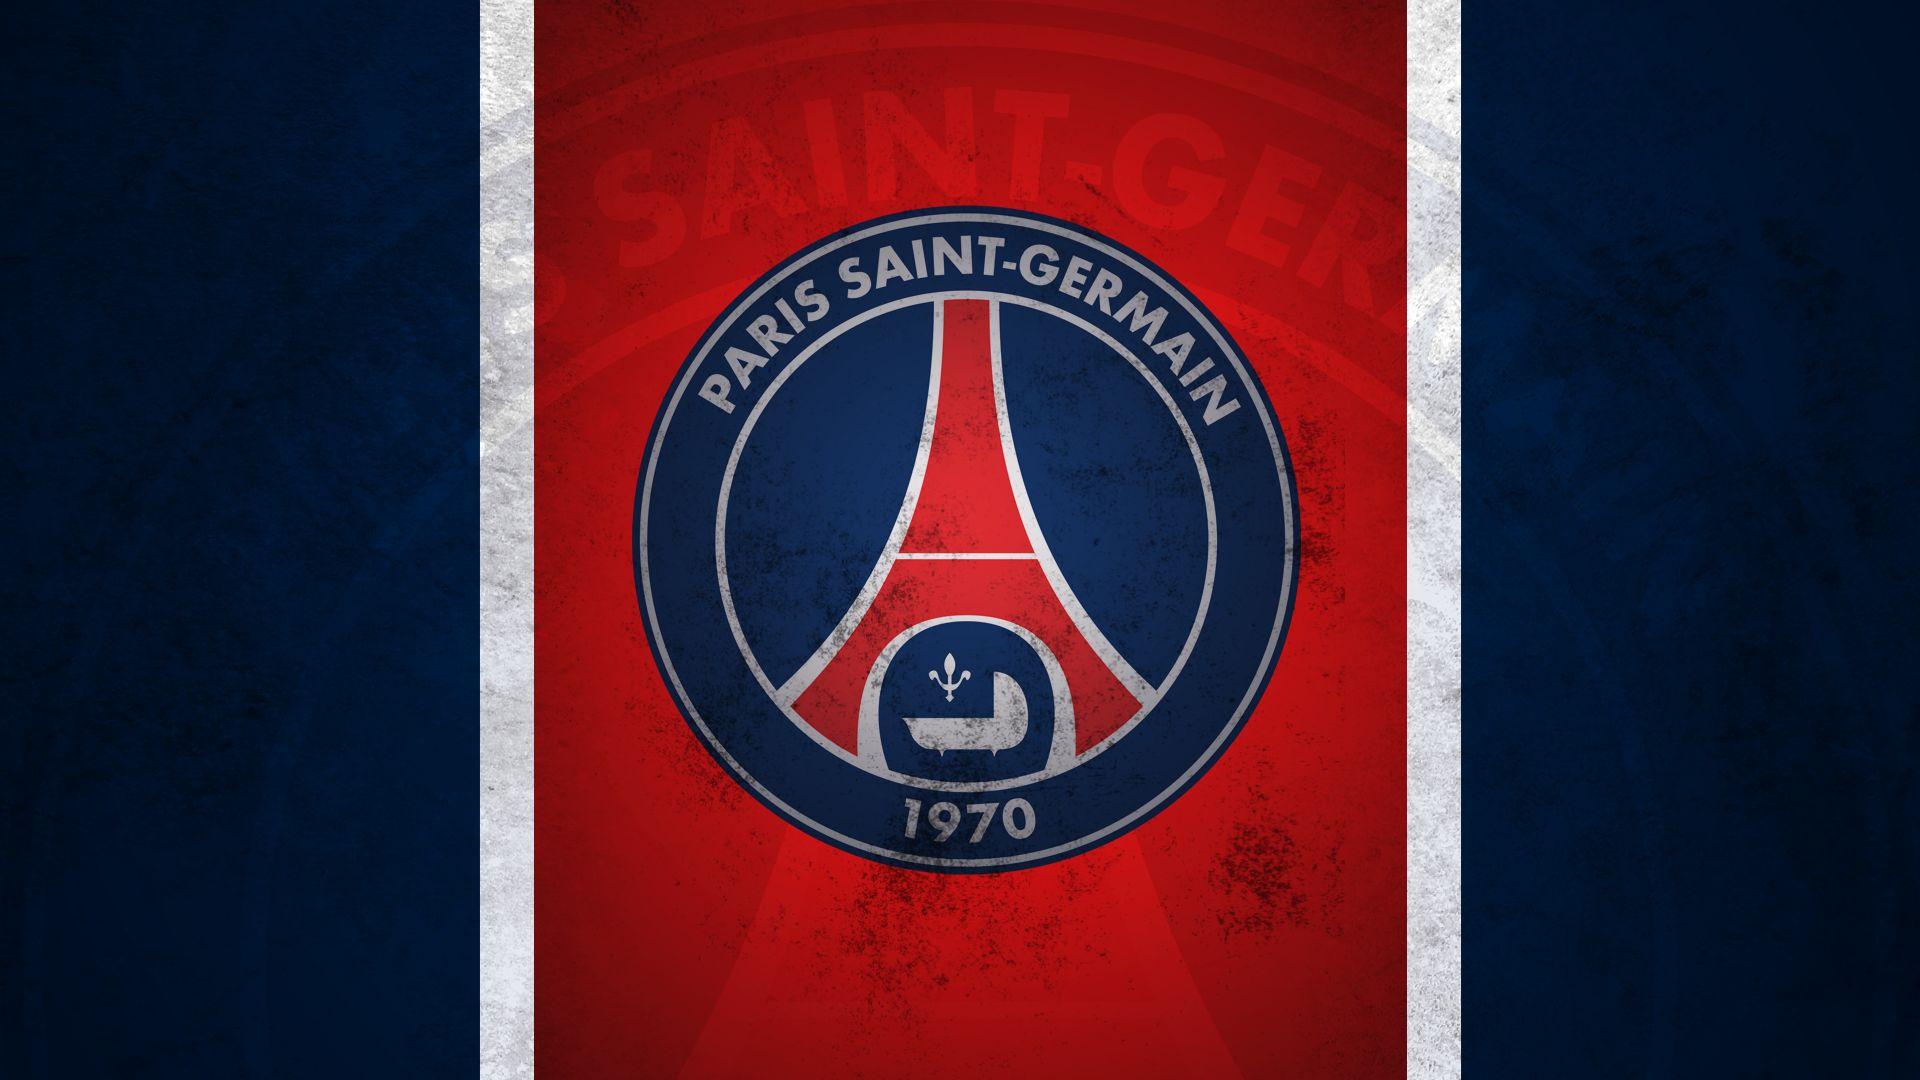 Paris Saint Germain Old Logo Exclusive HD Wallpapers 4978 1920x1080